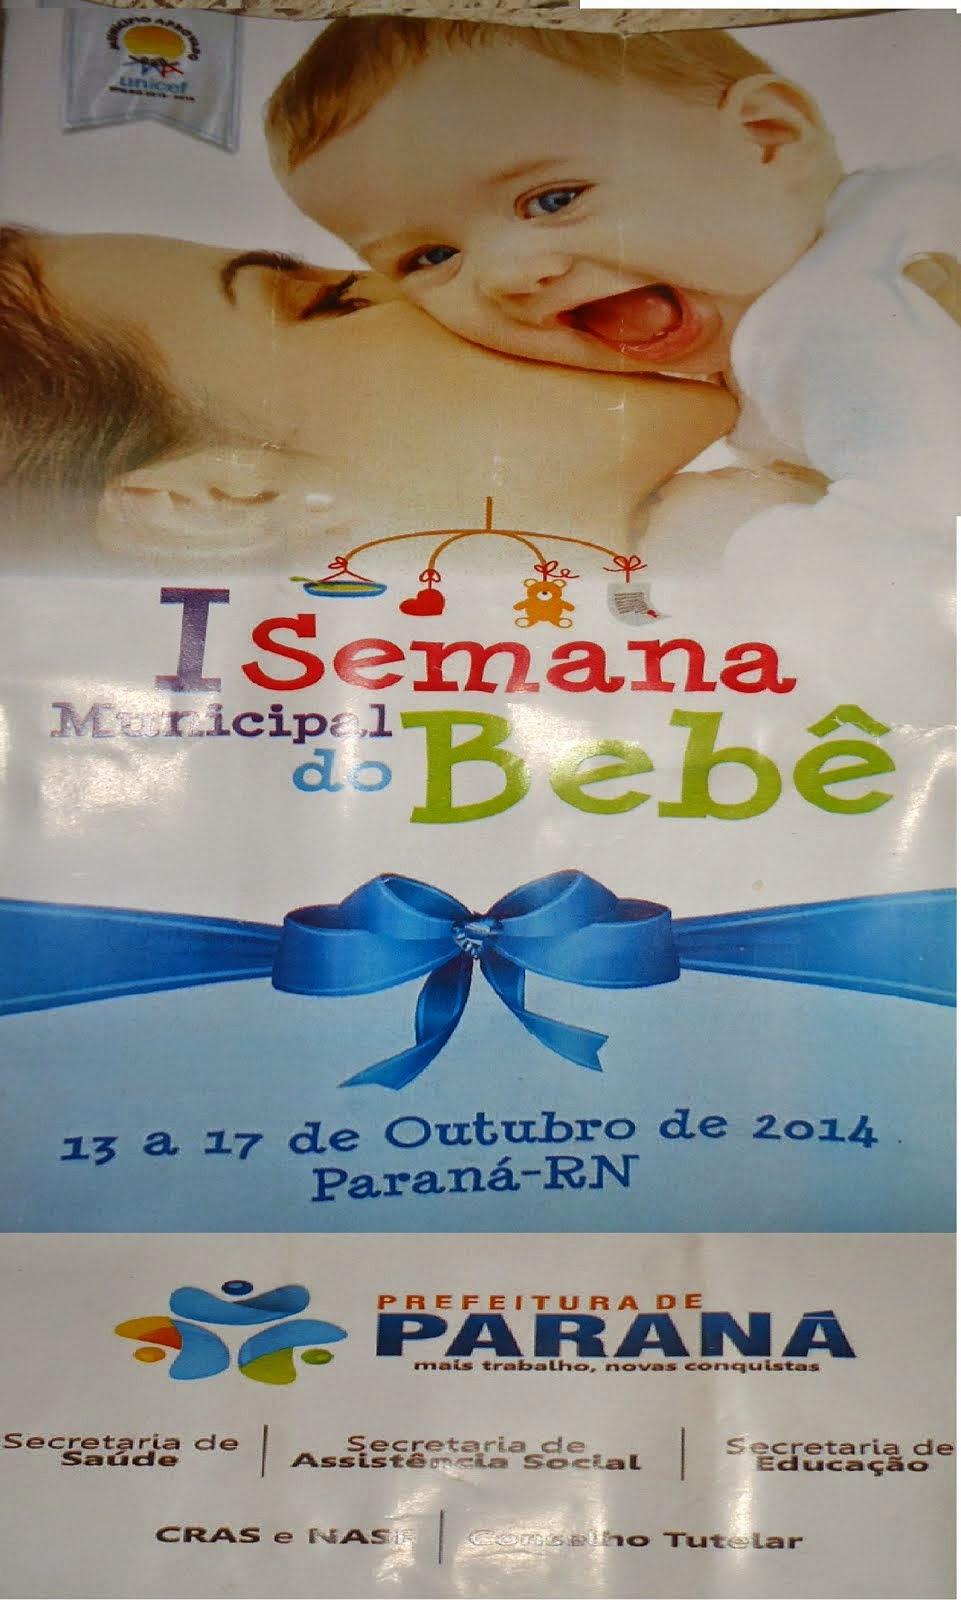 I Semana Municipal do bebê